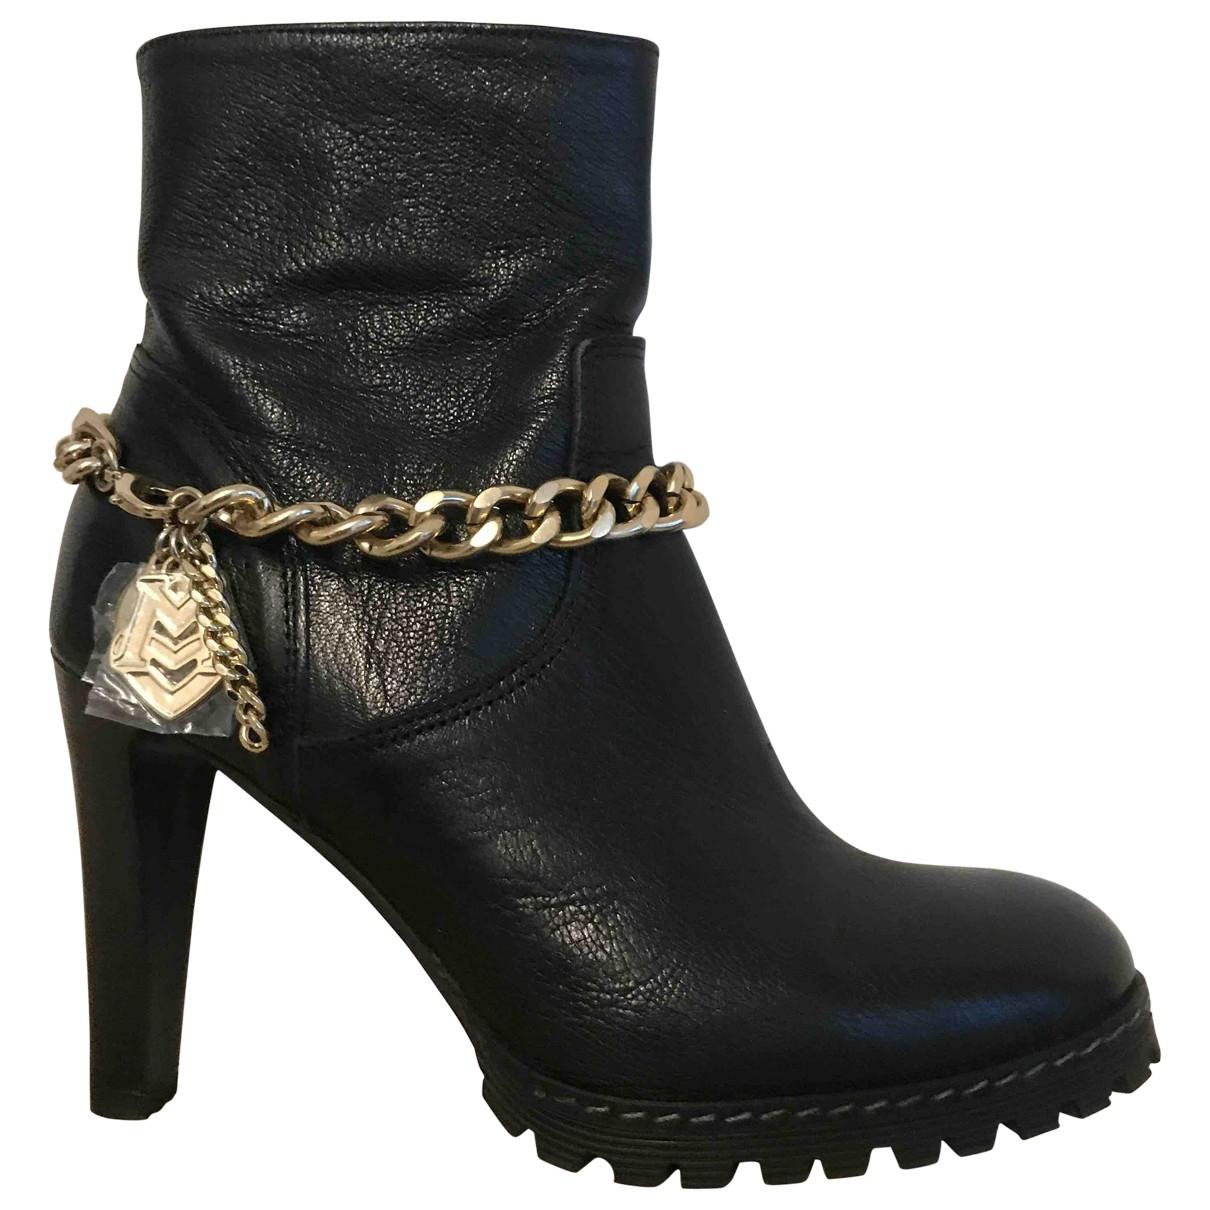 Moschino - Boots   pour femme en cuir - noir